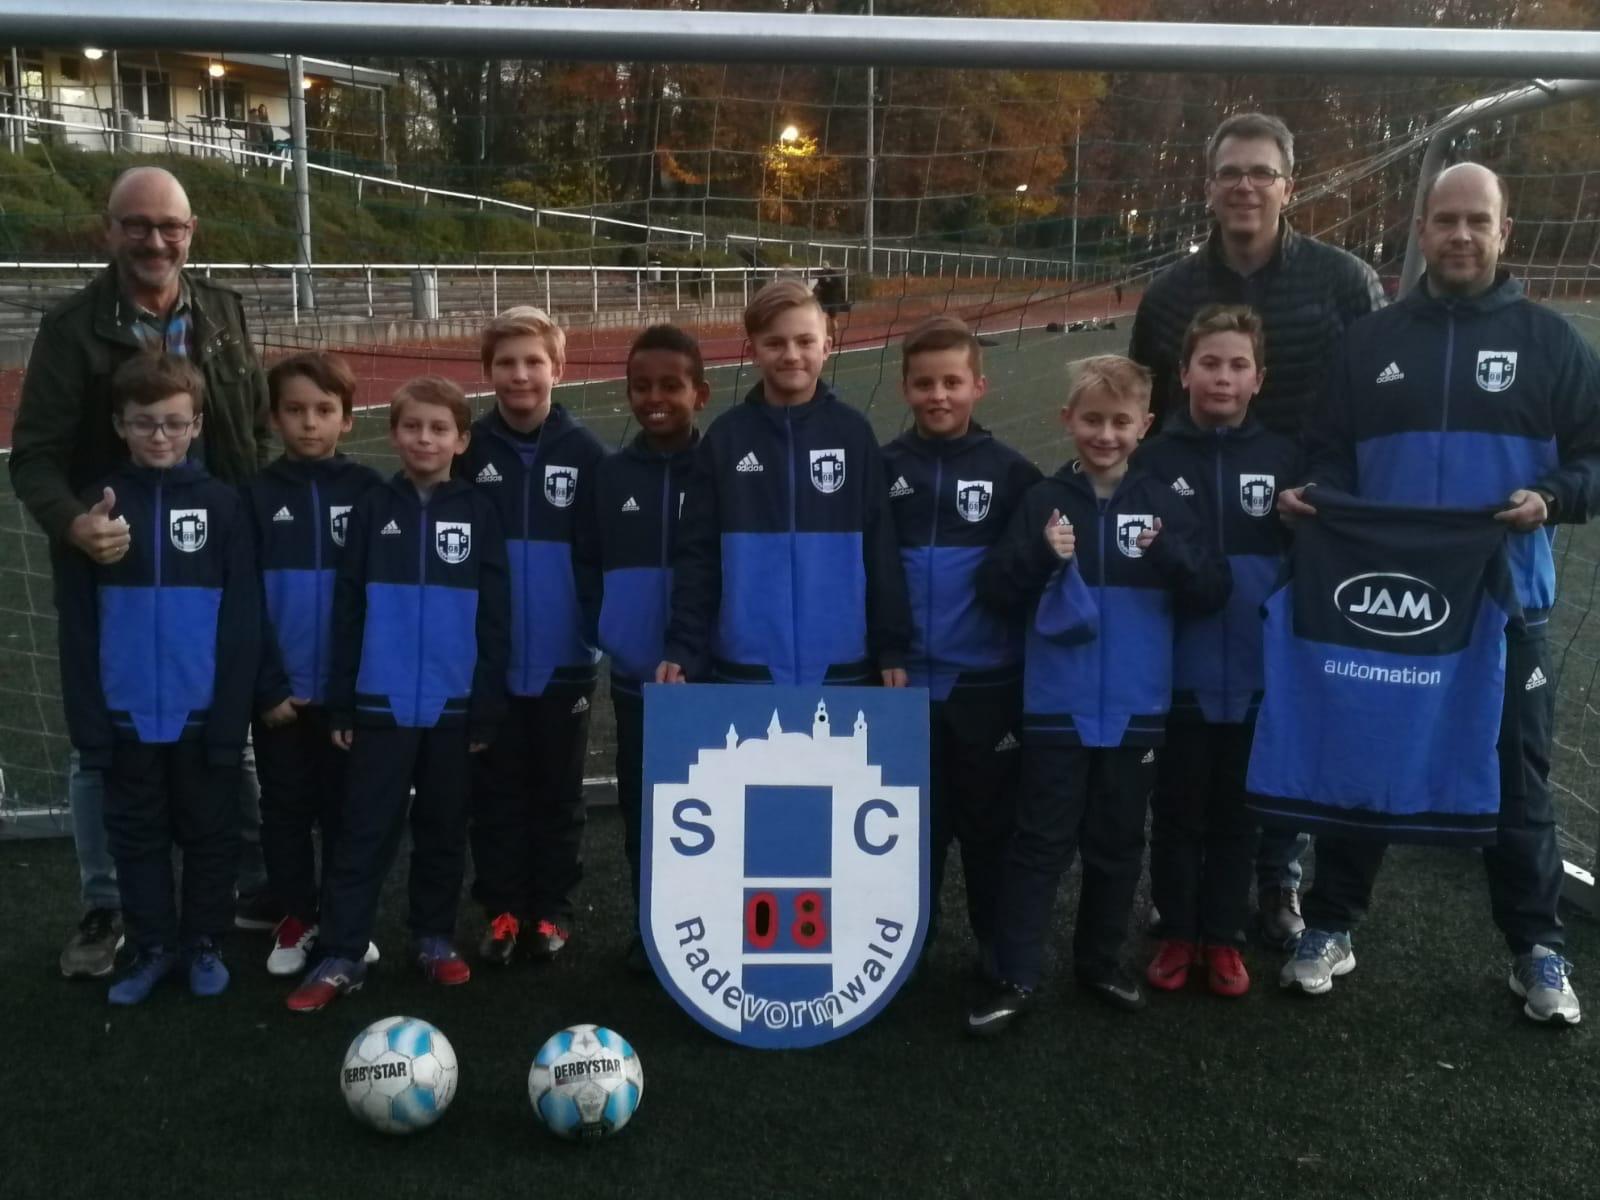 JAM-Automation sponsert der E1- Jugend vom Sportclub 08 Radevormwald neue Trainingsanzüge